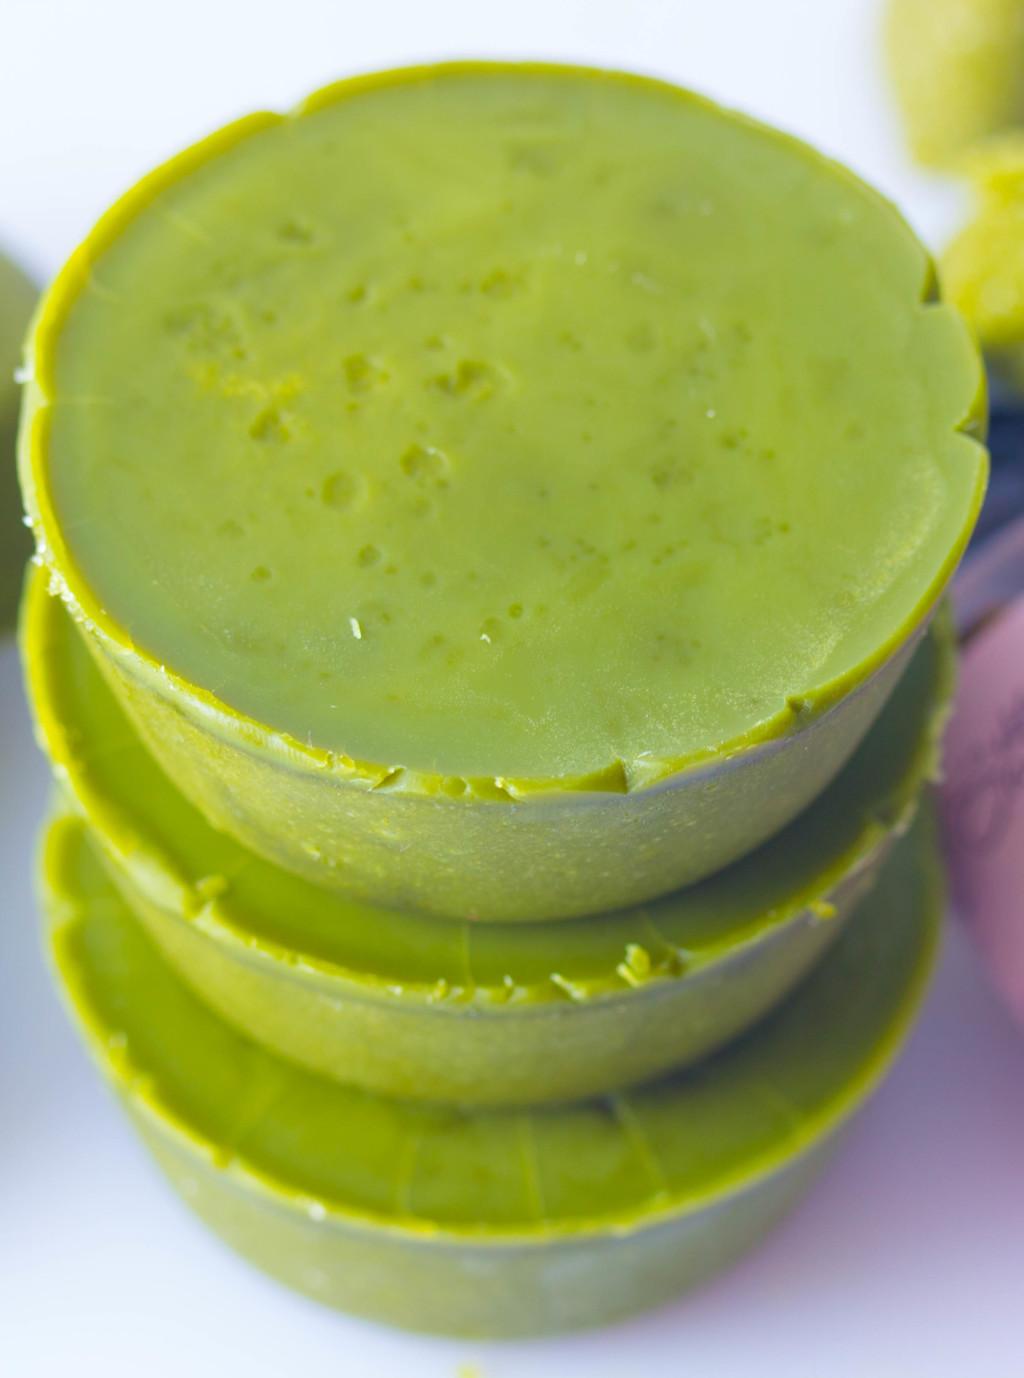 Green Tea Body Scrub Soap | Homemade Soap Recipes @ xokatierosario.com